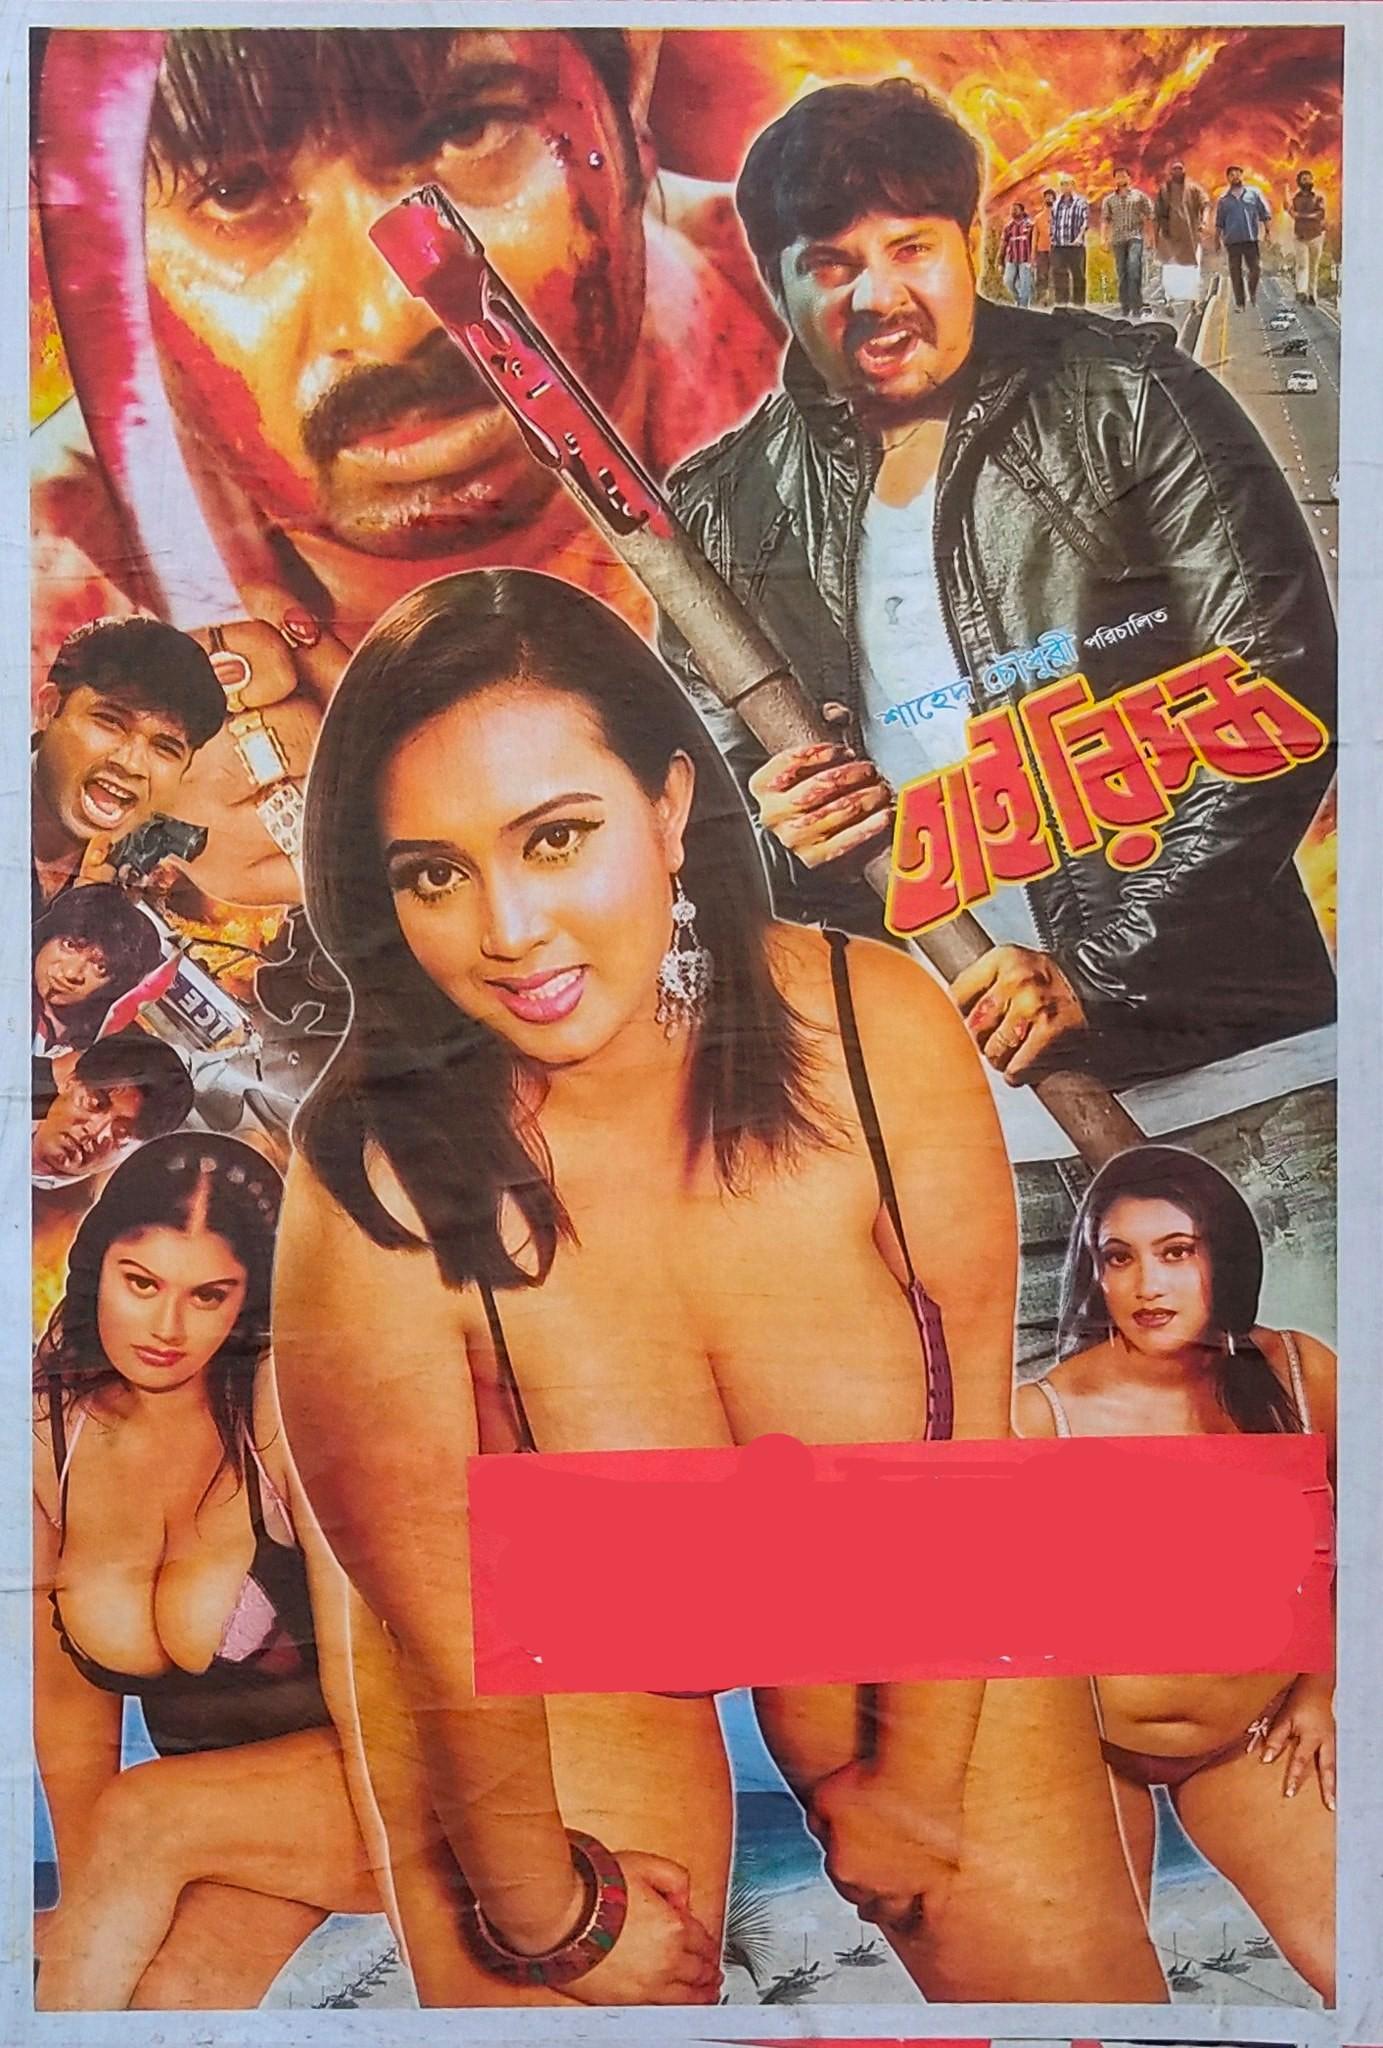 18+ Hai Risk 2021 Bangla Hot Movie 720p HDRip 1GB Downloadv